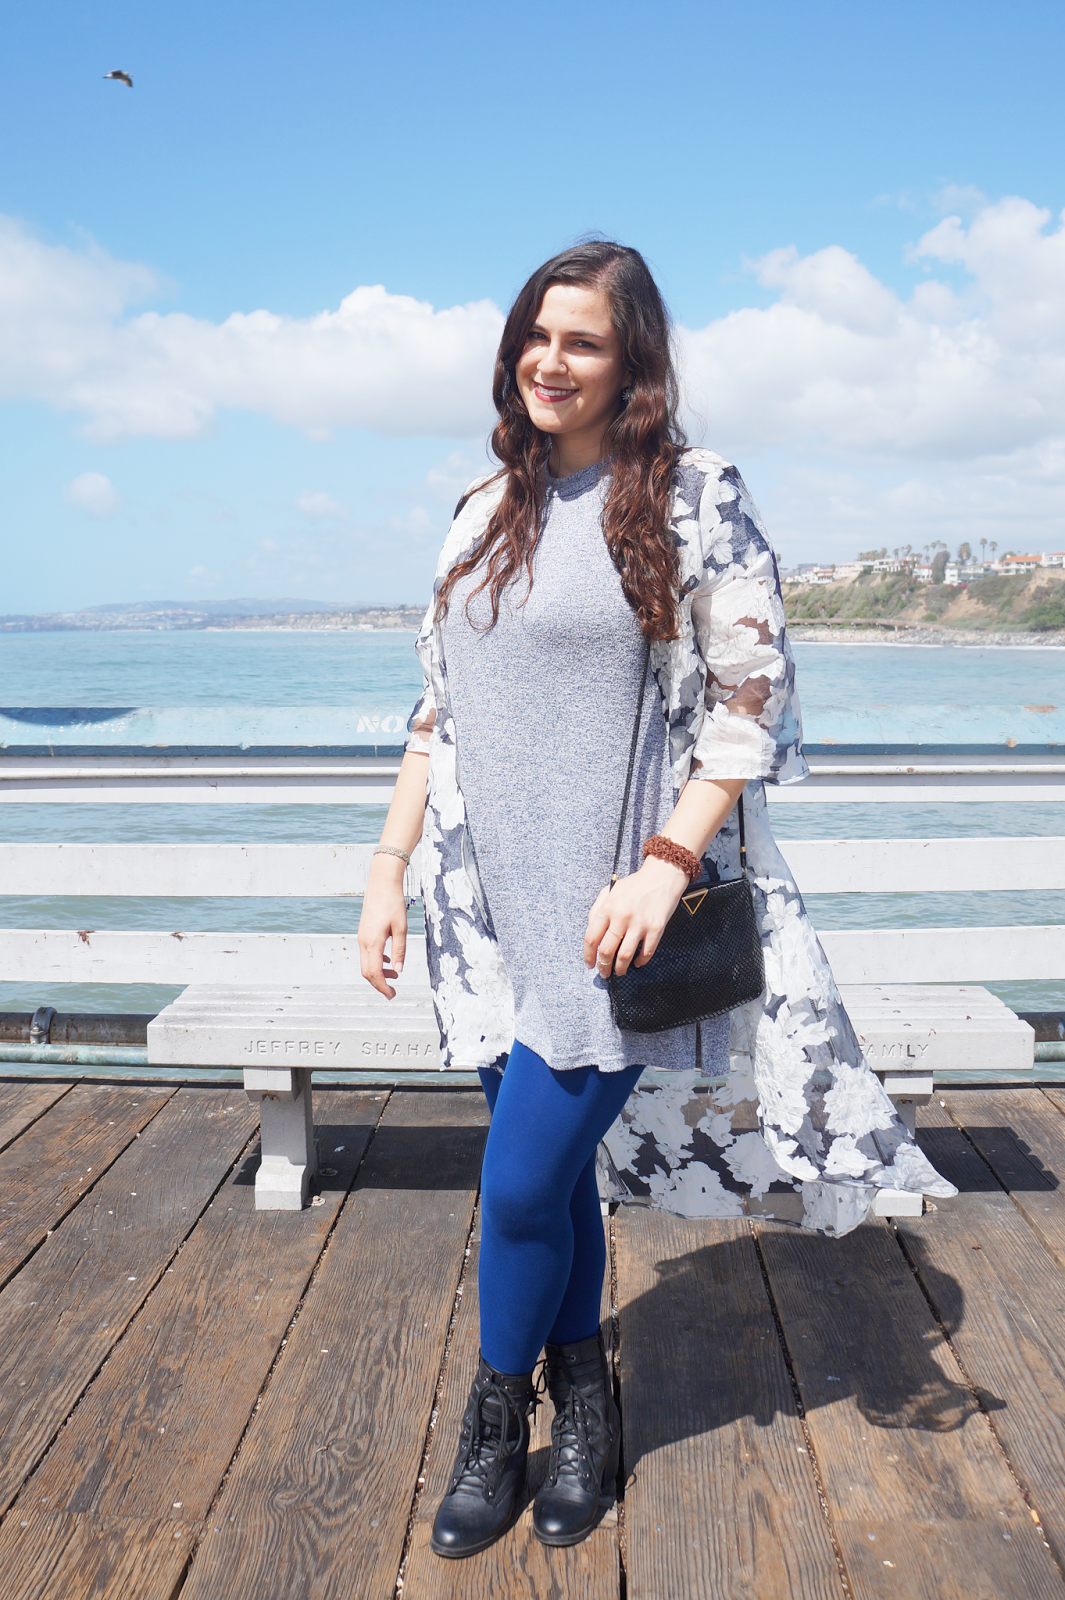 san clemente pier, california lifestyle blogger